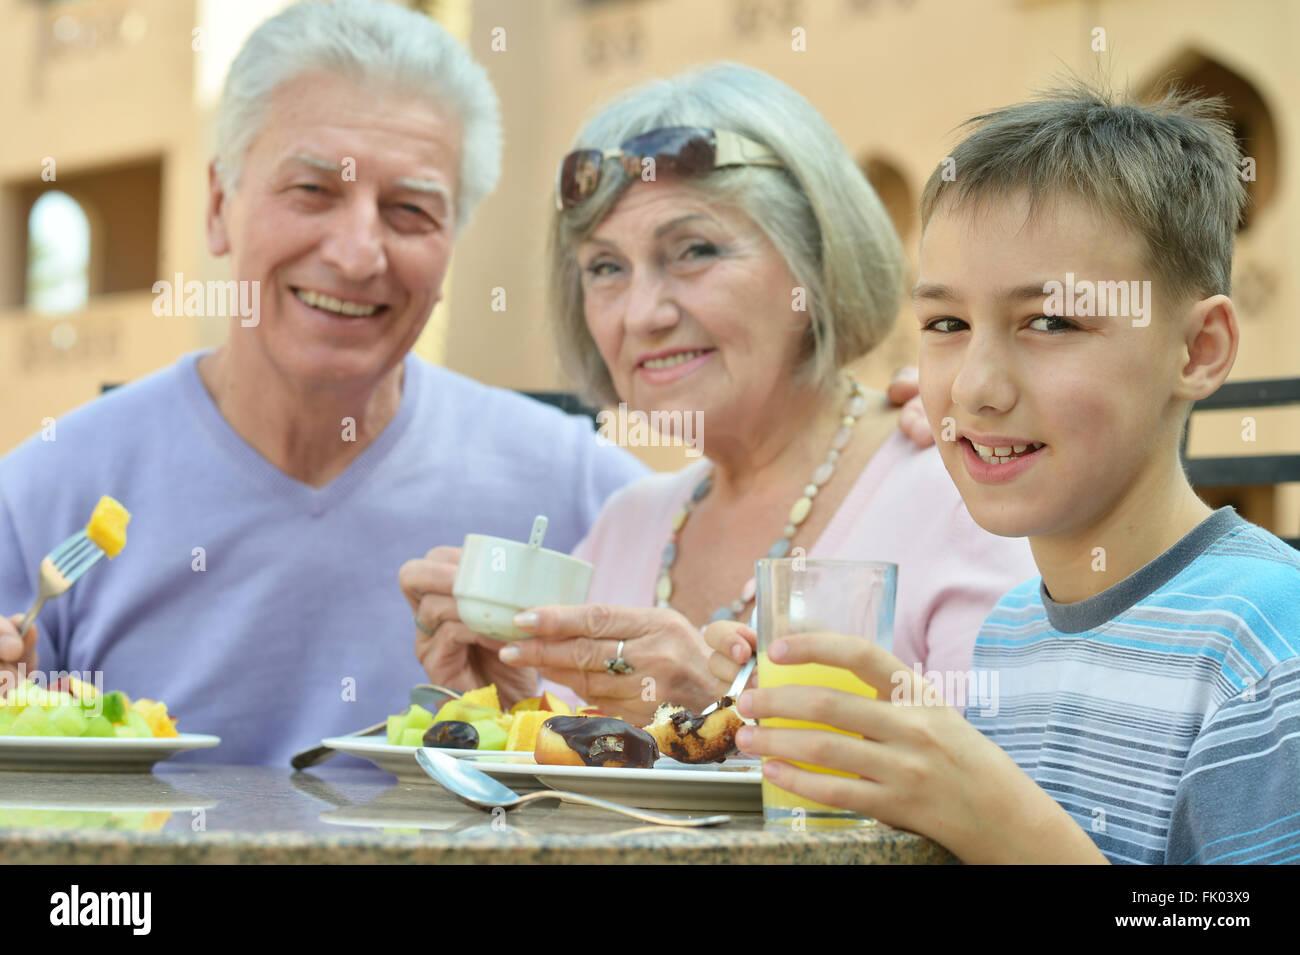 Grandparents with grandchild - Stock Image